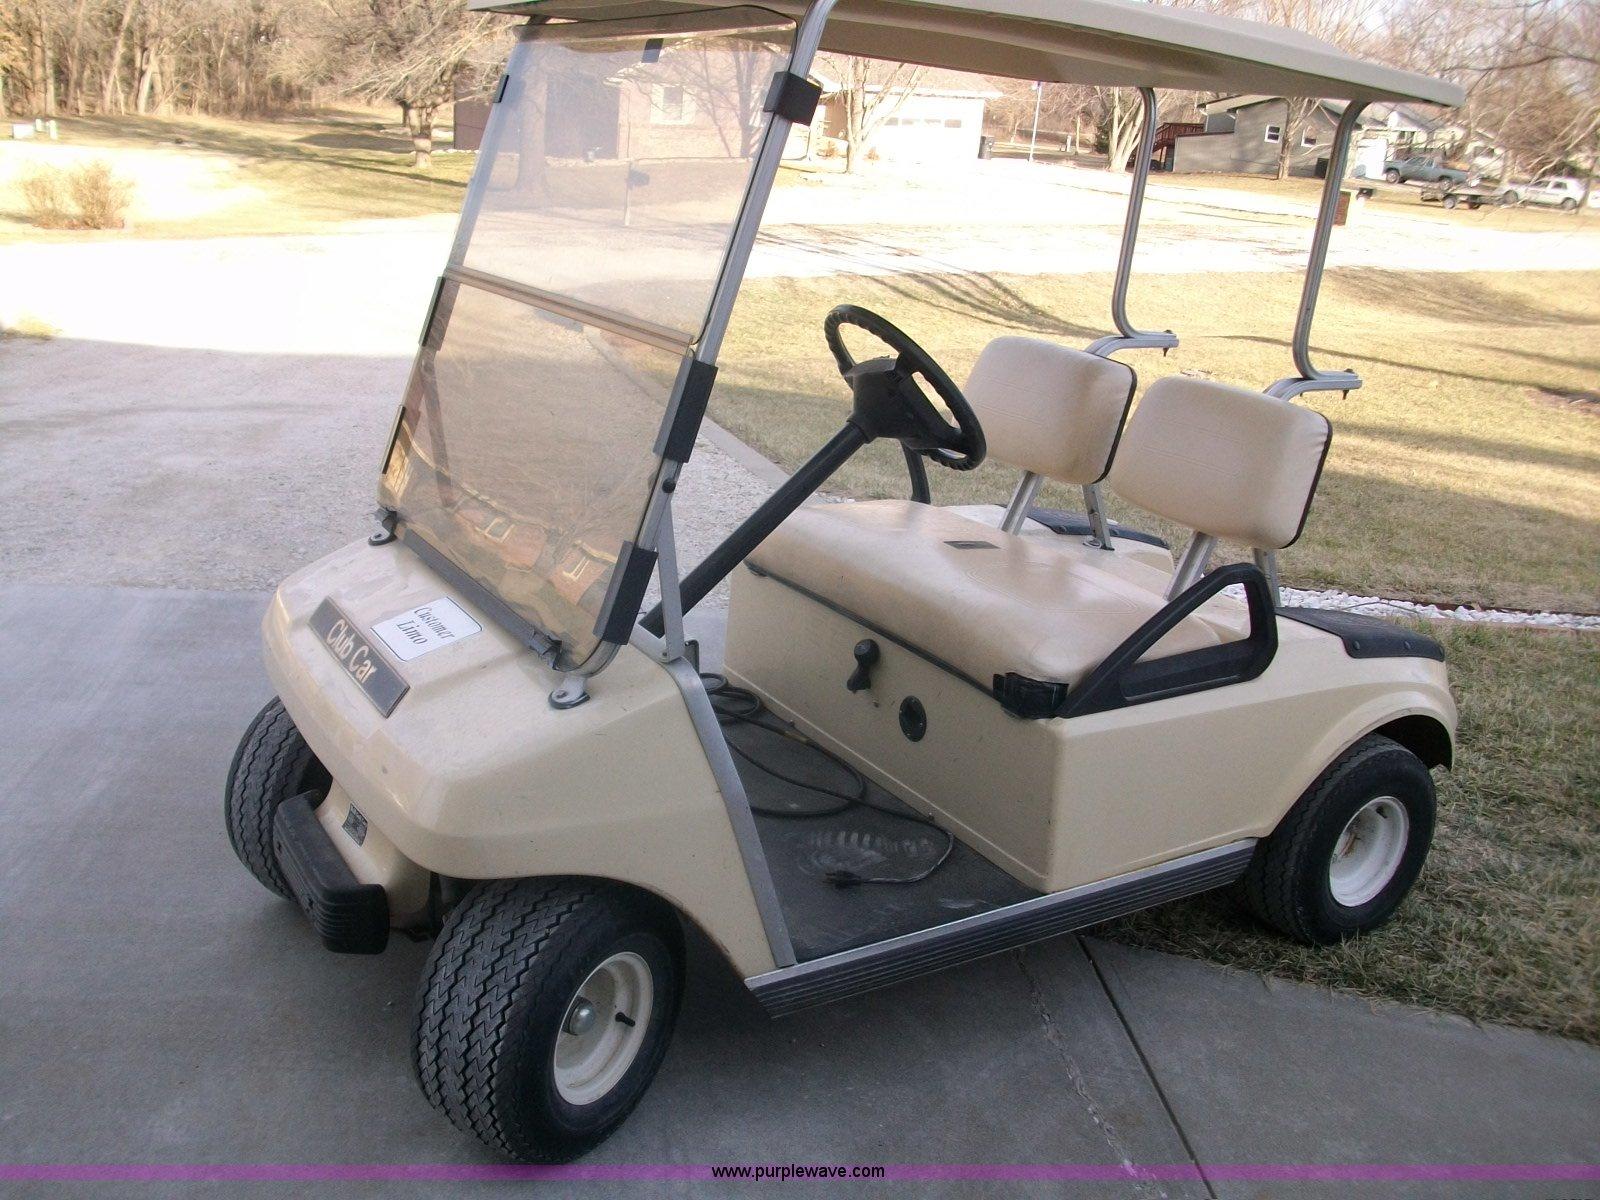 1993 club car electric golf cart item a1809 sold januar rh purplewave com HP Laptop User Manual HP Laptop User Manual